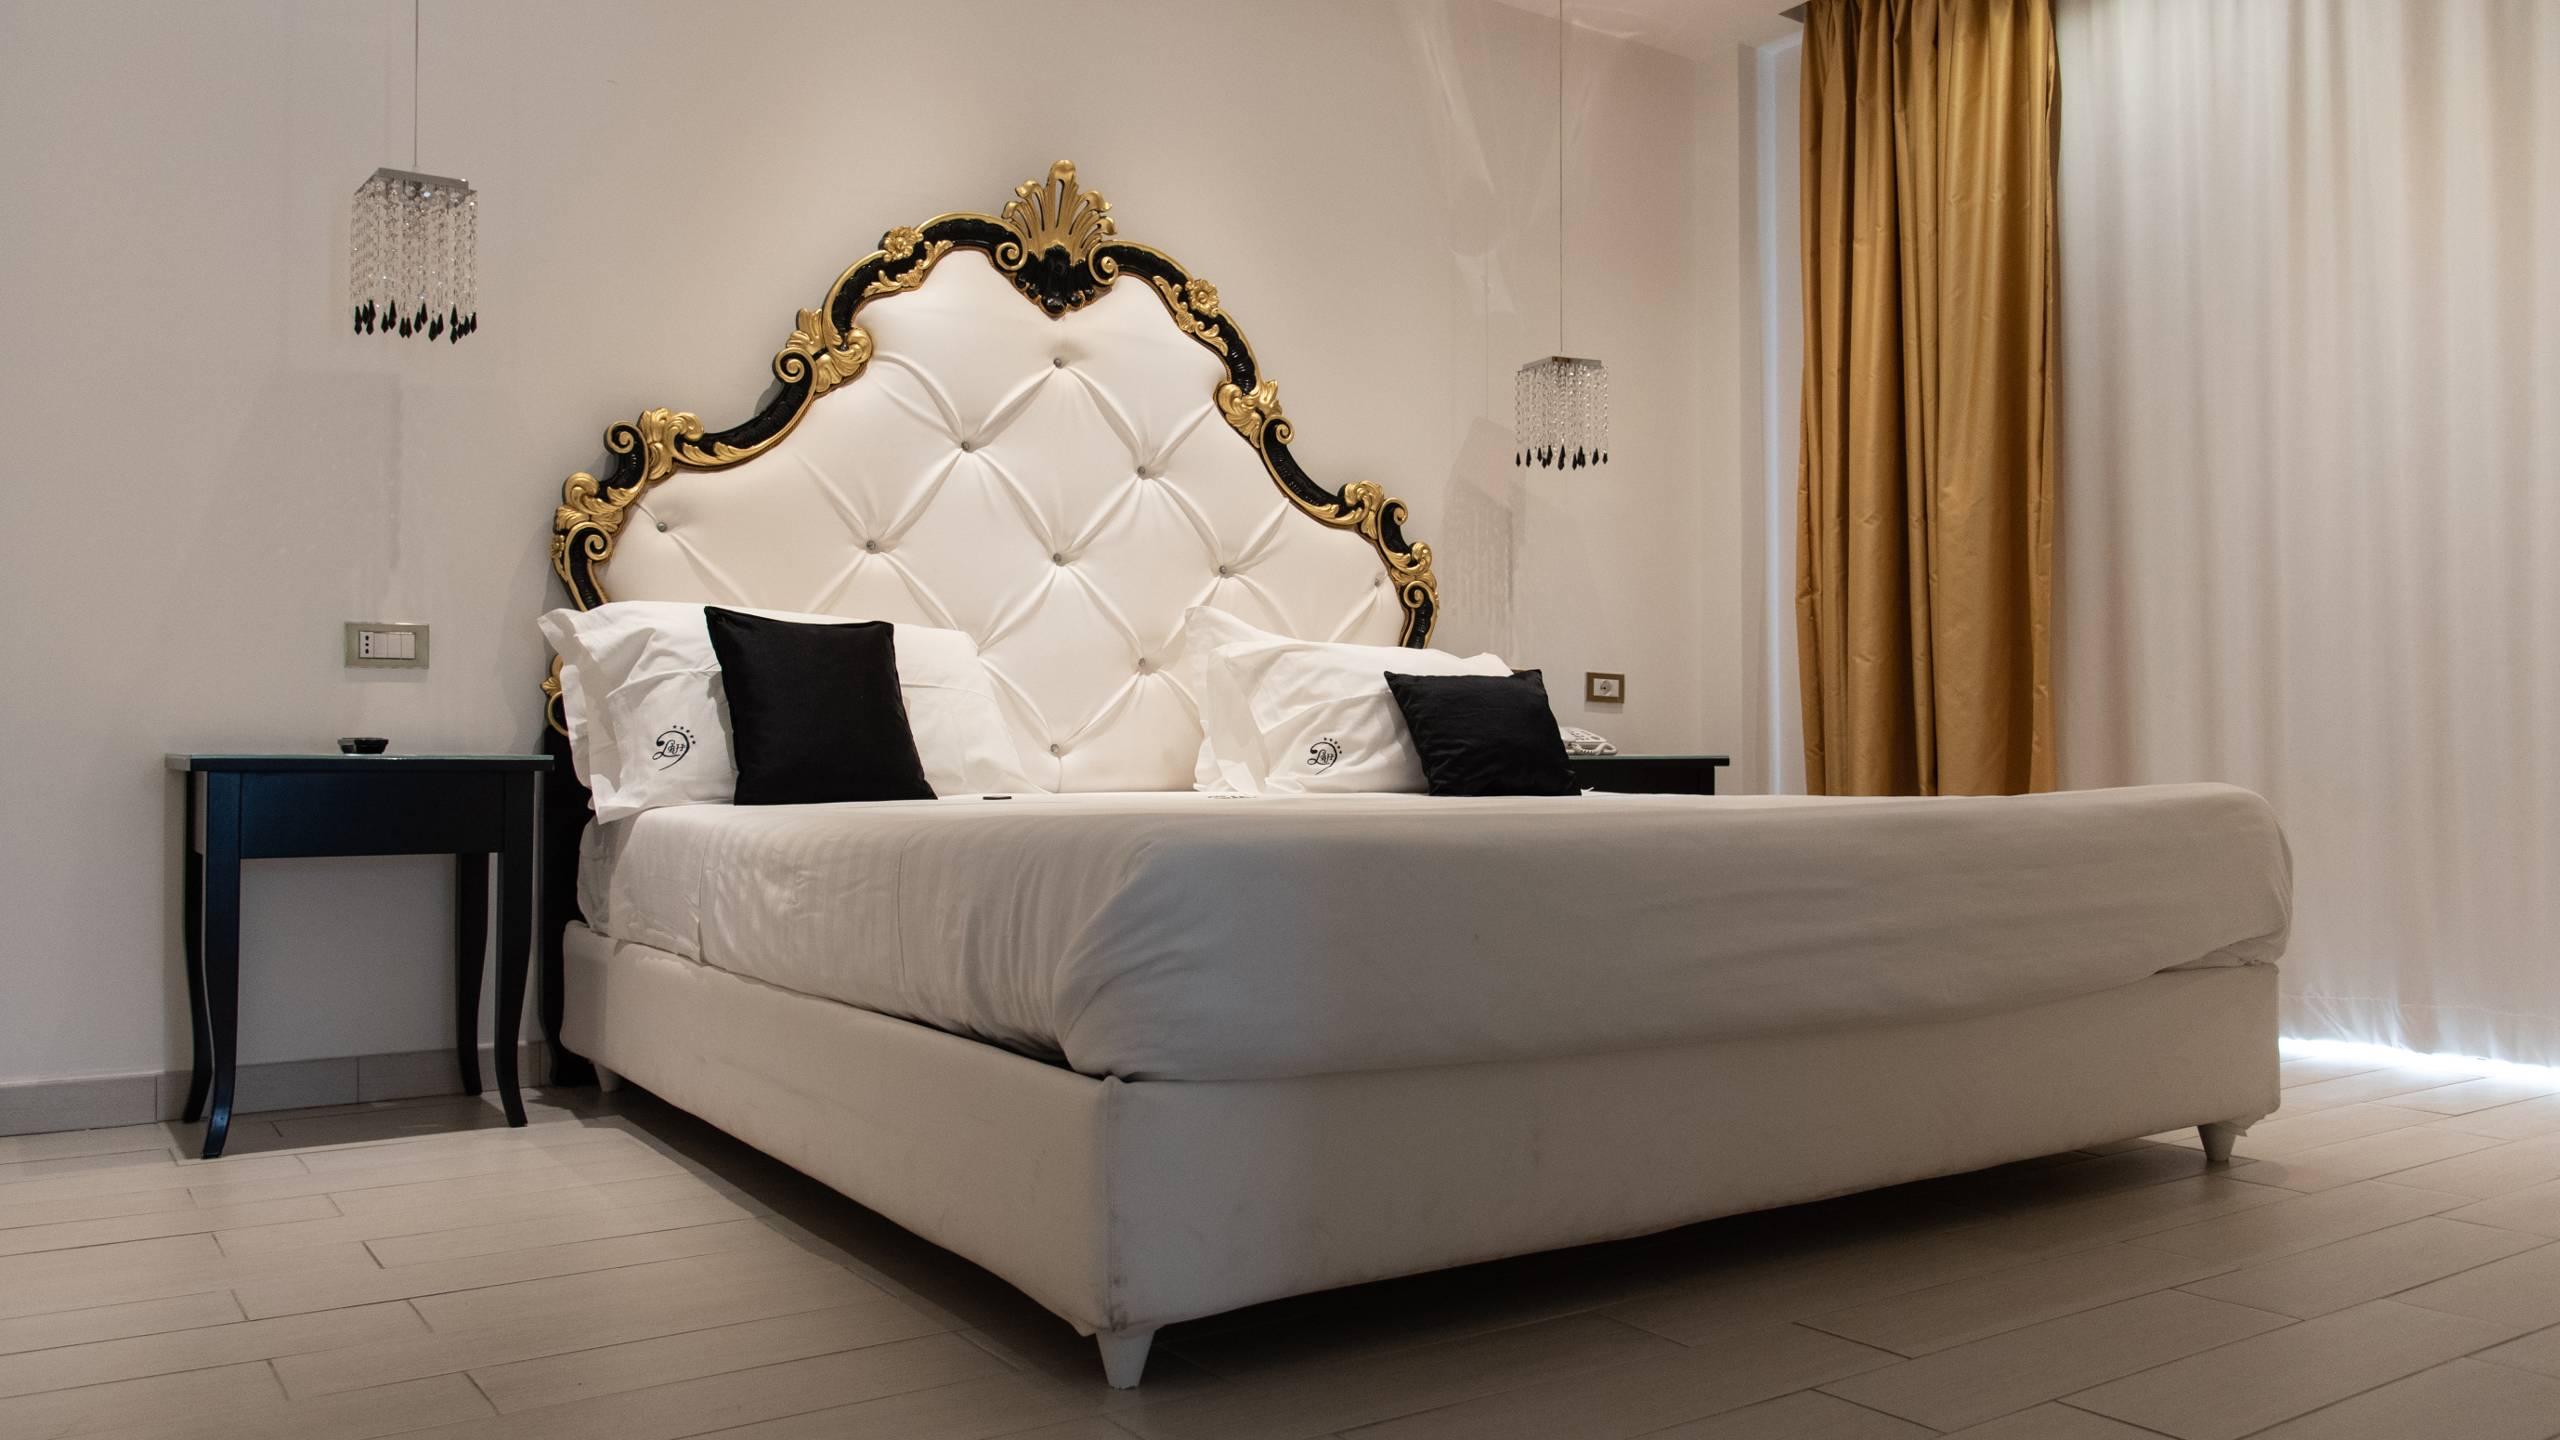 Hotel-Ludwig-Bolsena-suite-DSC-0274